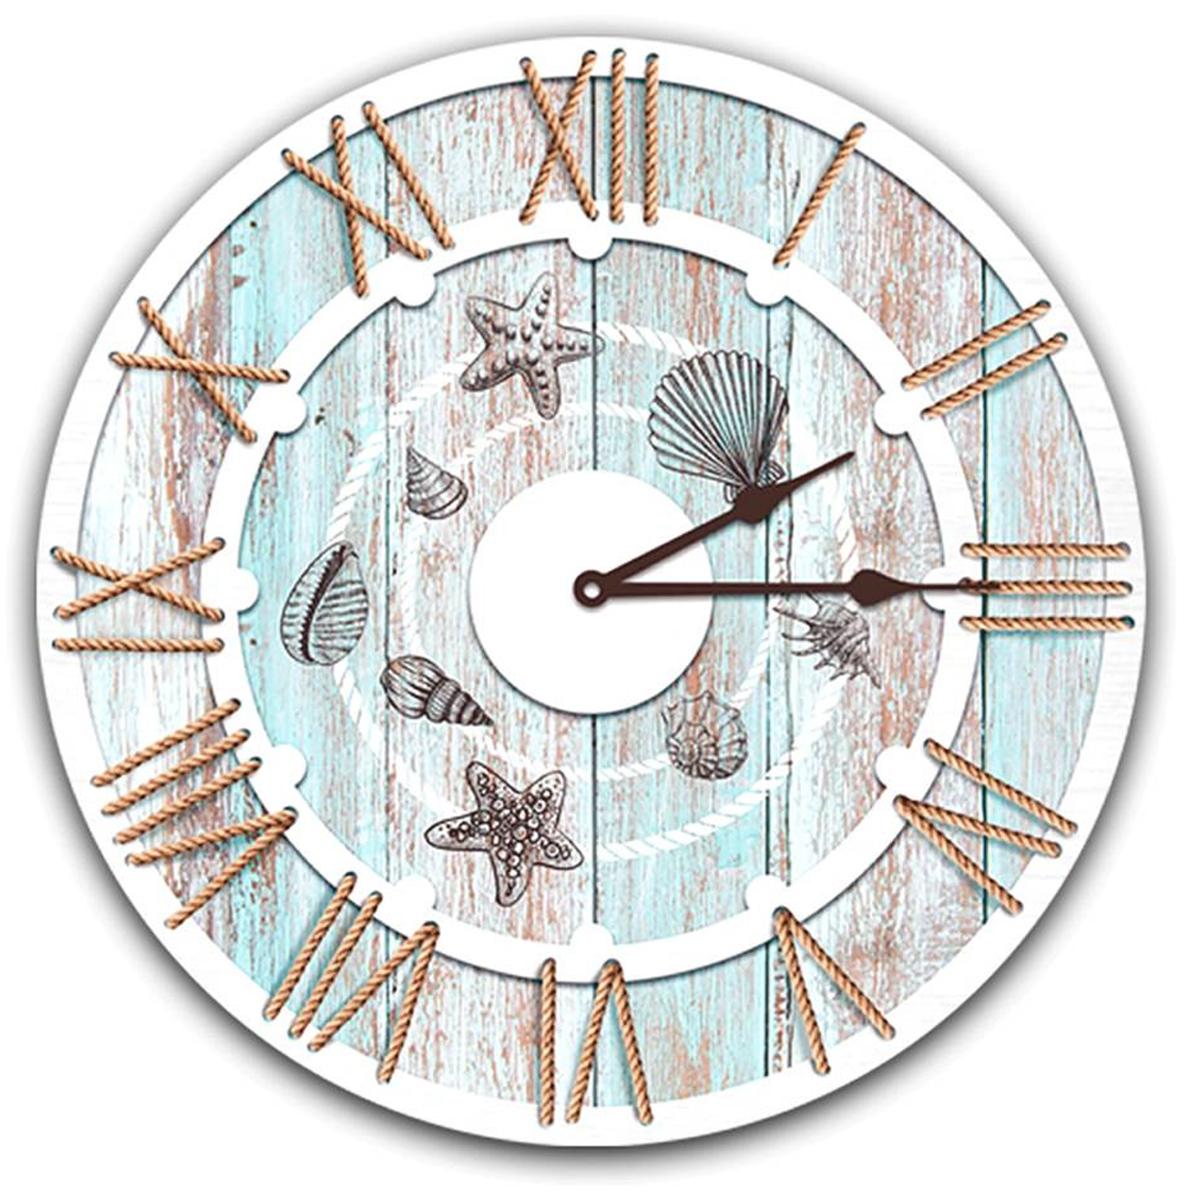 Horloge Murale \'Monde Marin\' beige bleu (coquillages-étoiles) - 40 cm - [Q8270]